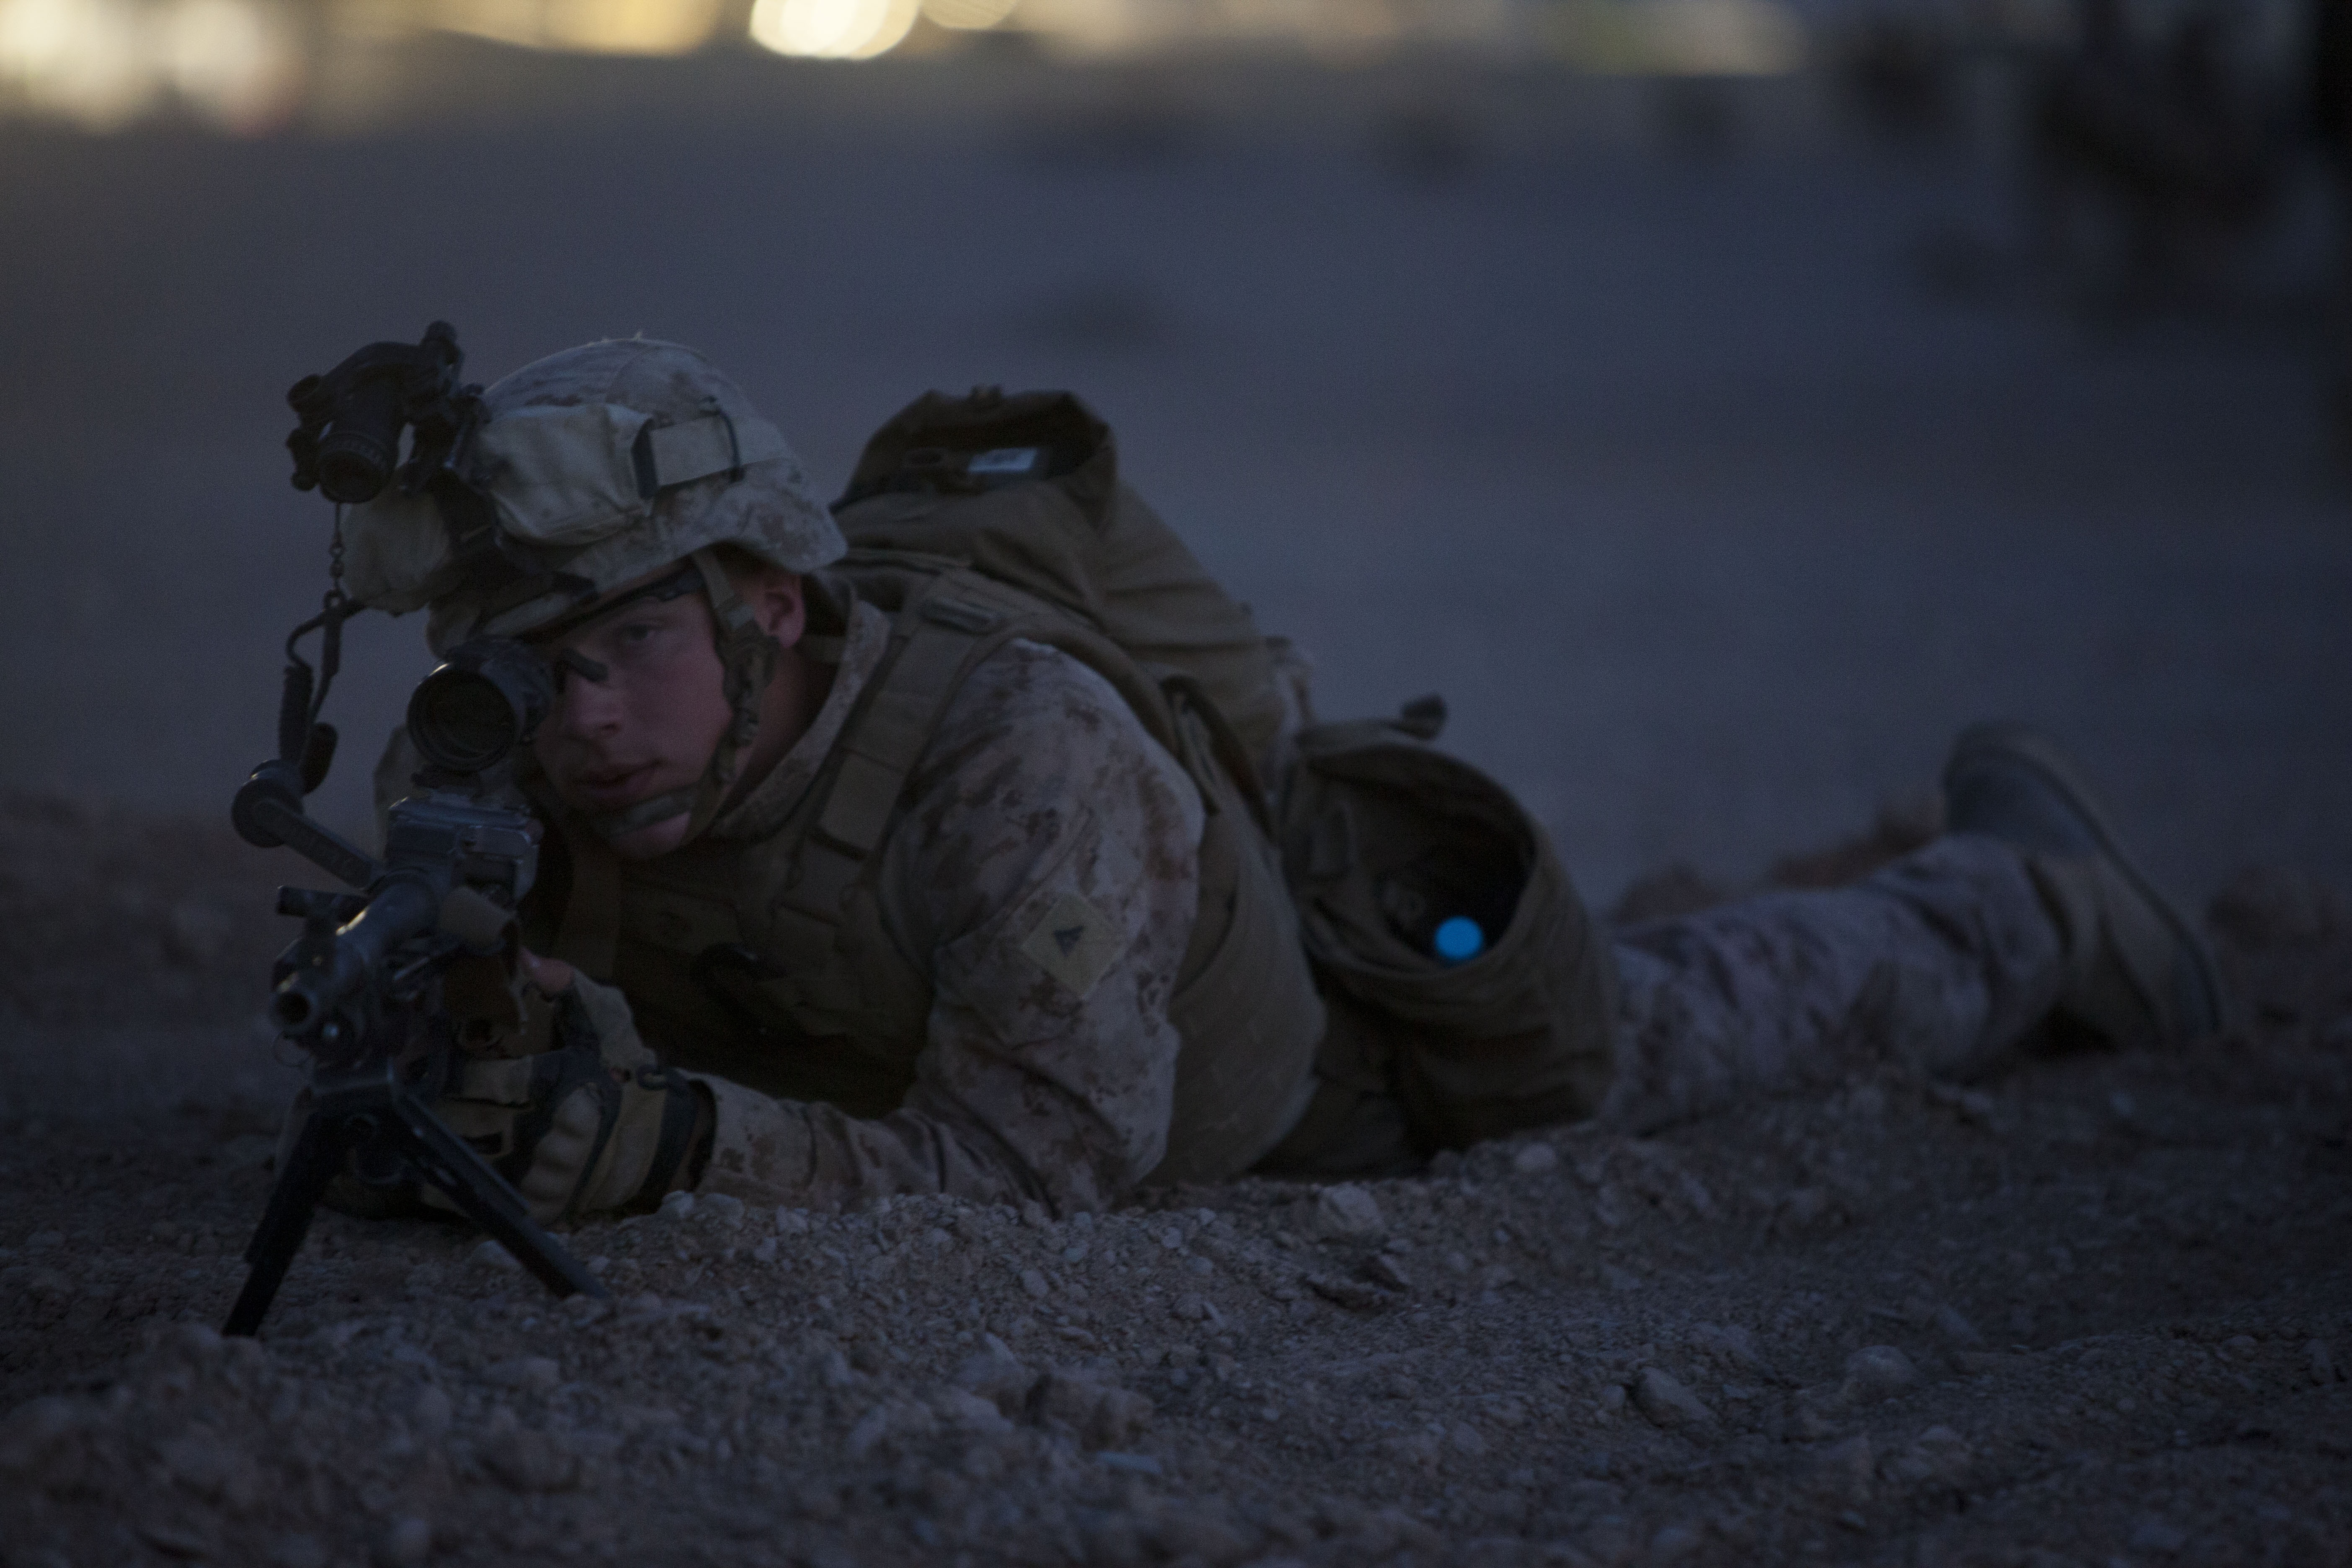 K Marine Viii File:A U.S. Marine wit...